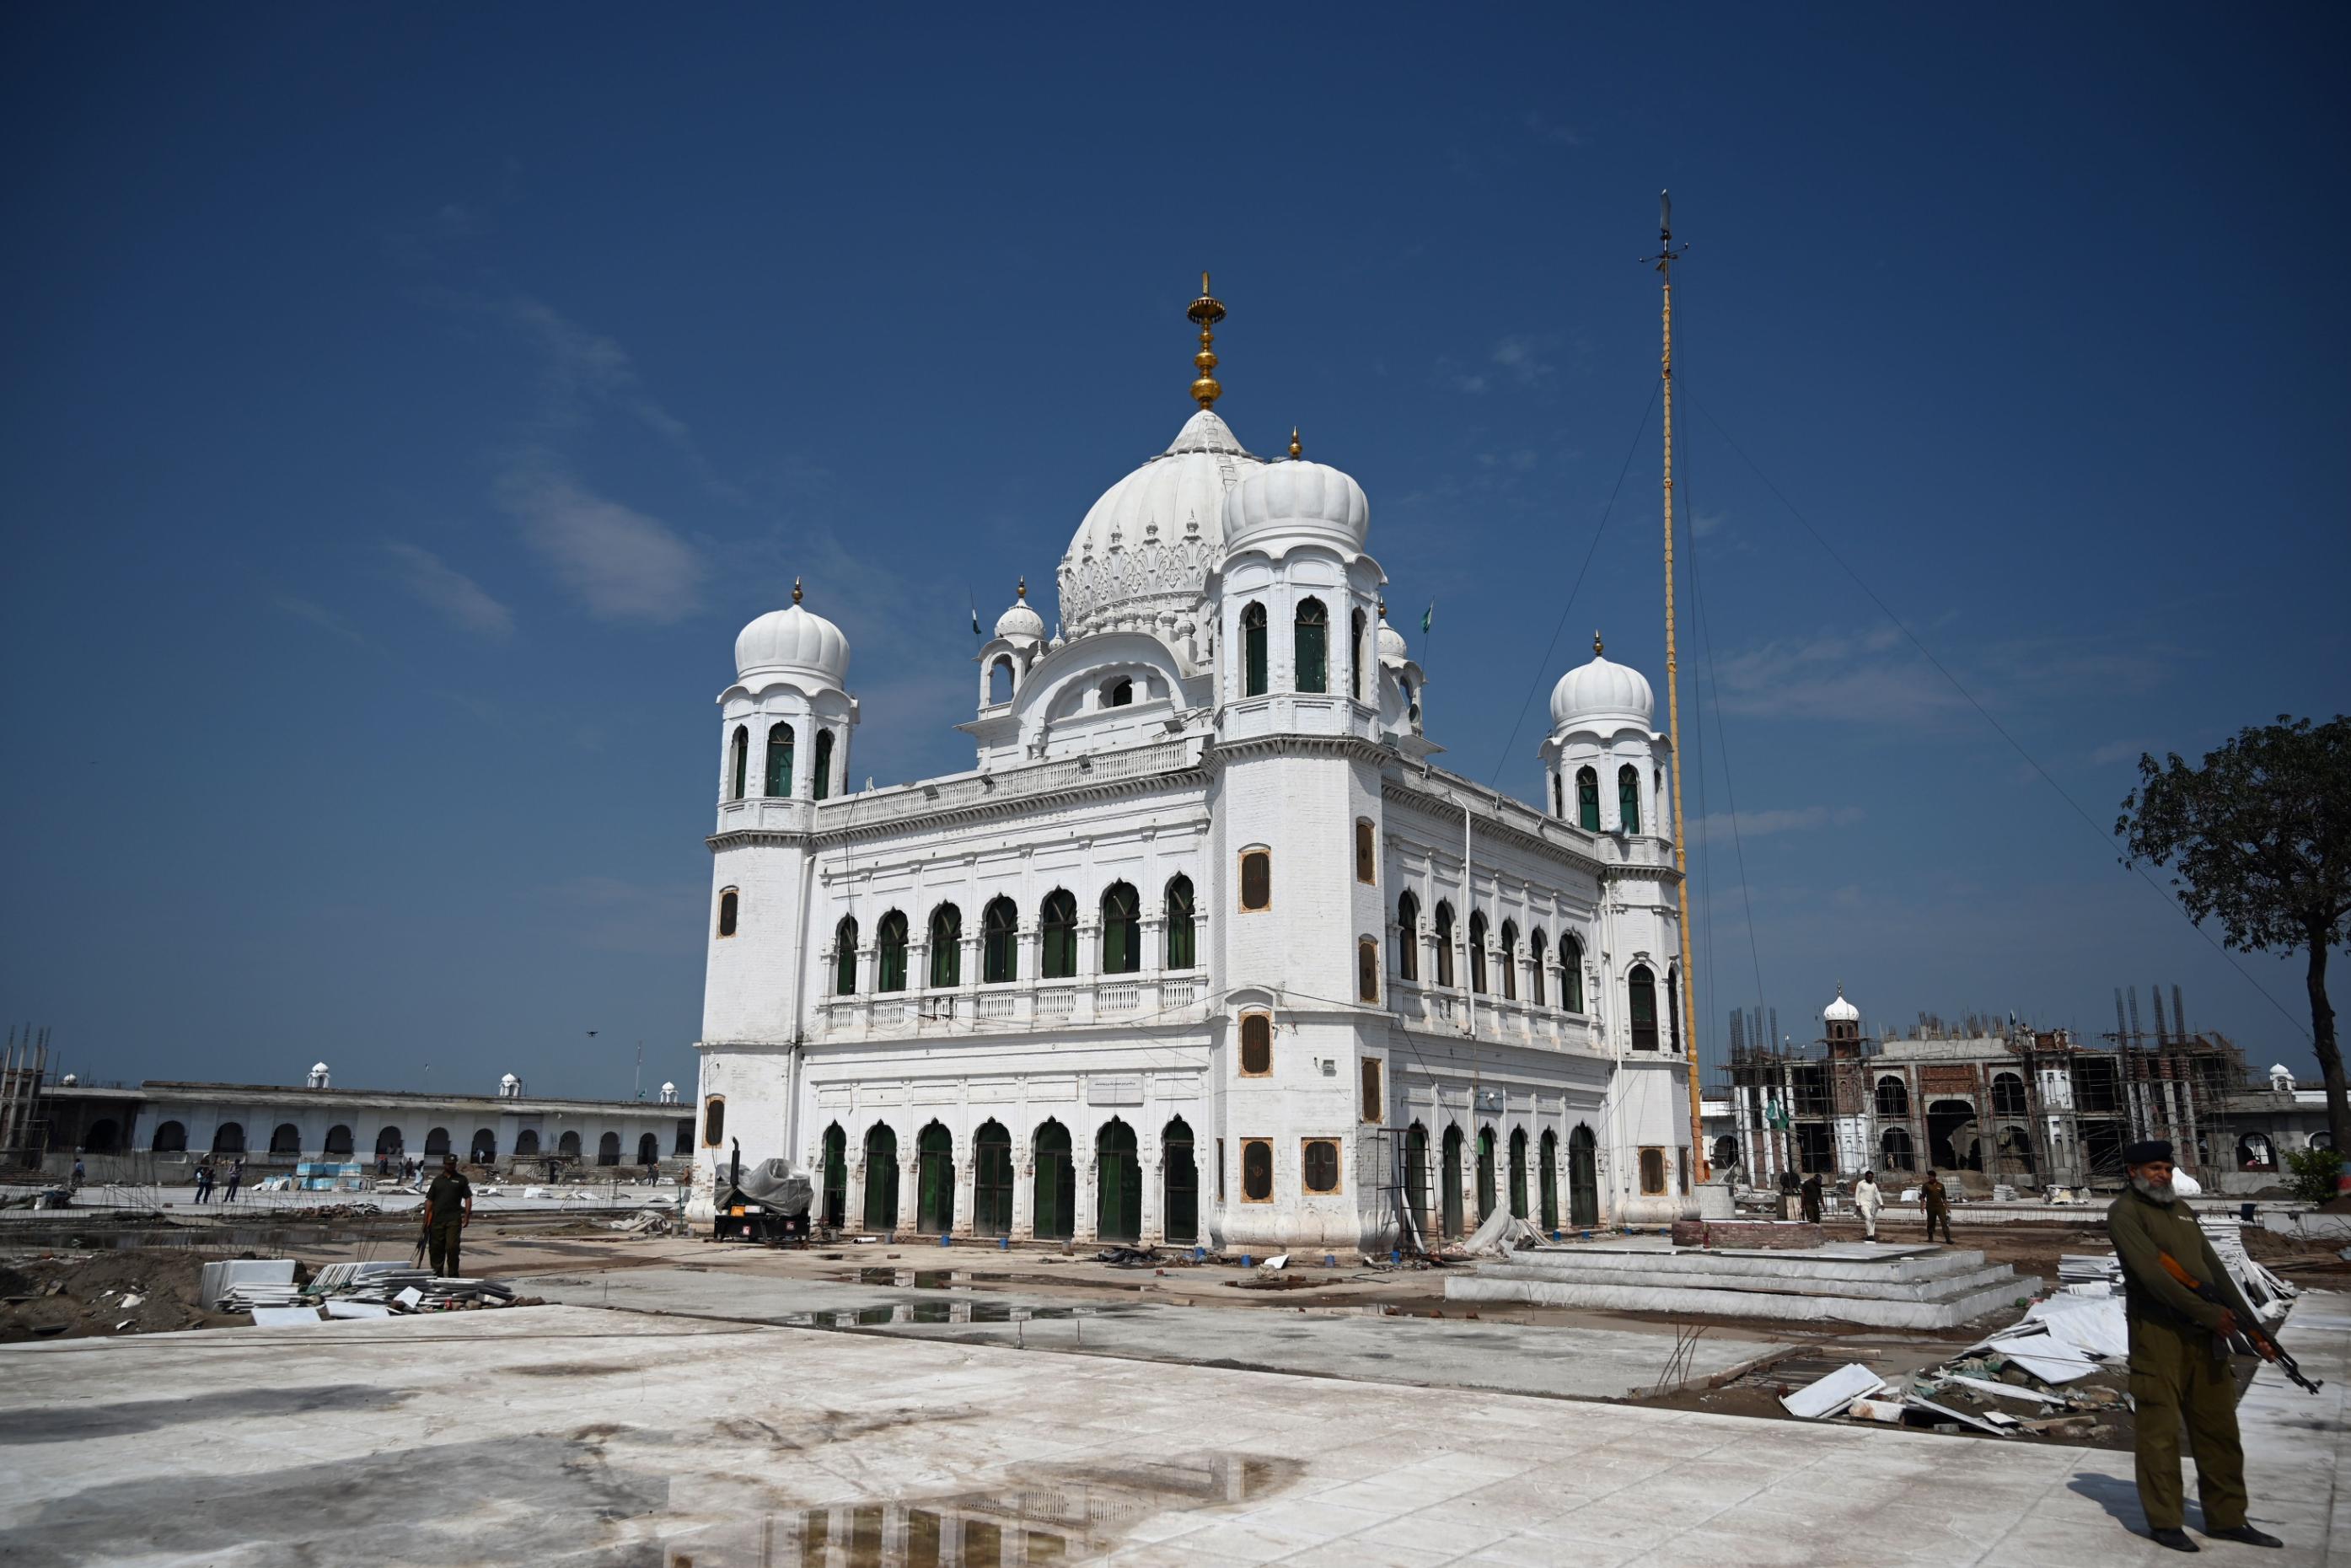 Historic Kartarpur 'peace corridor' between India and Pakistan opens   CNN Travel